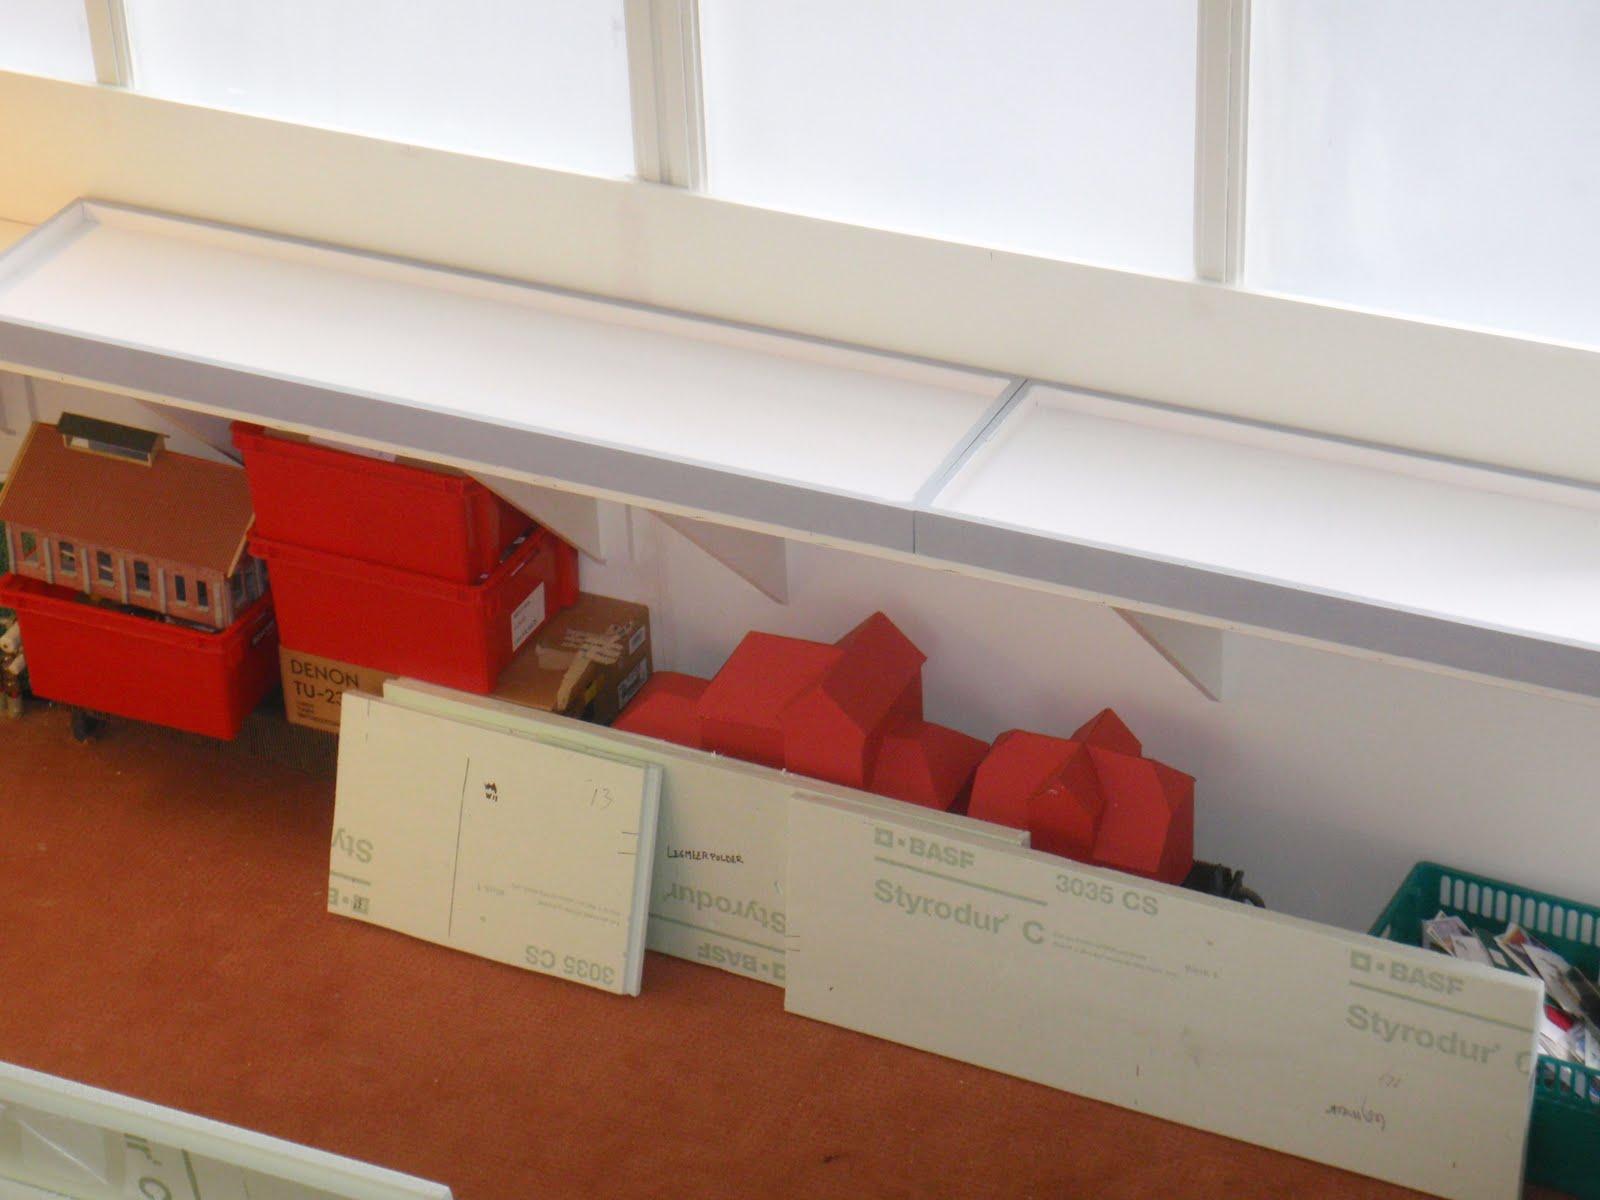 spoor 0 modelbouw 1 45 de modelbaan. Black Bedroom Furniture Sets. Home Design Ideas